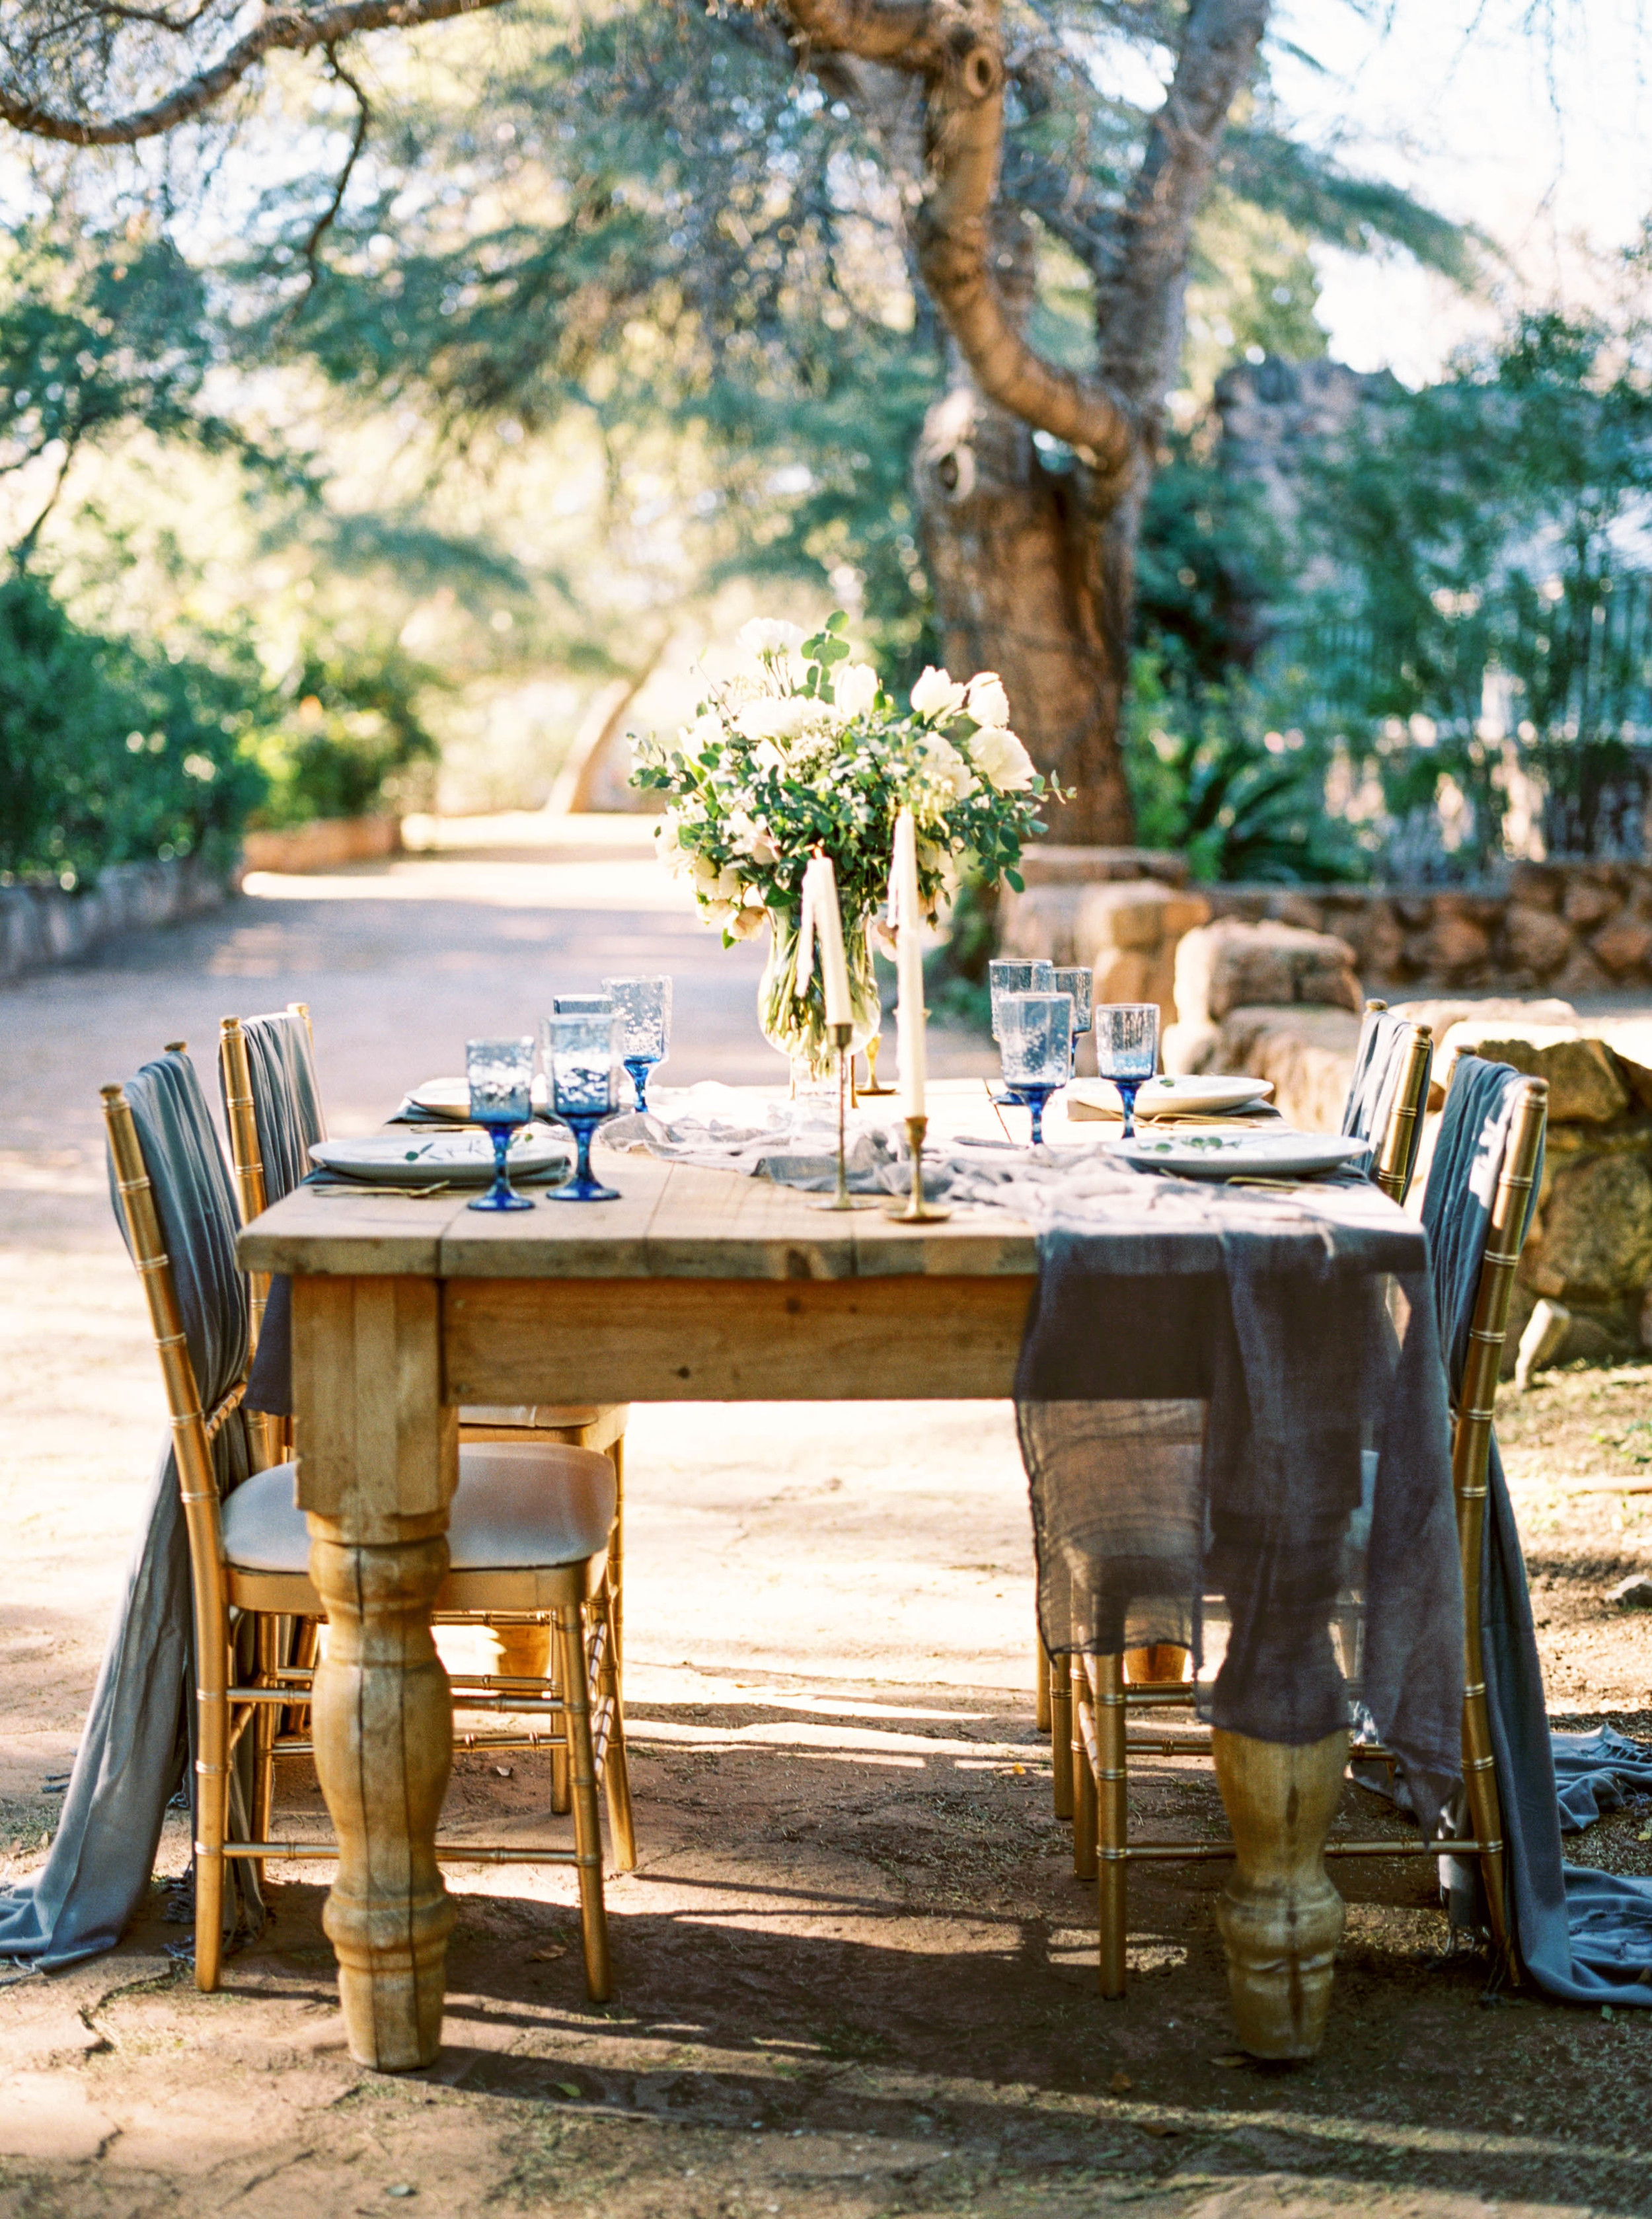 Danford-Photography-Bozeman-Montana-Arizona-Fine Art Film-Wedding-Engagement-Photographers-27.jpg